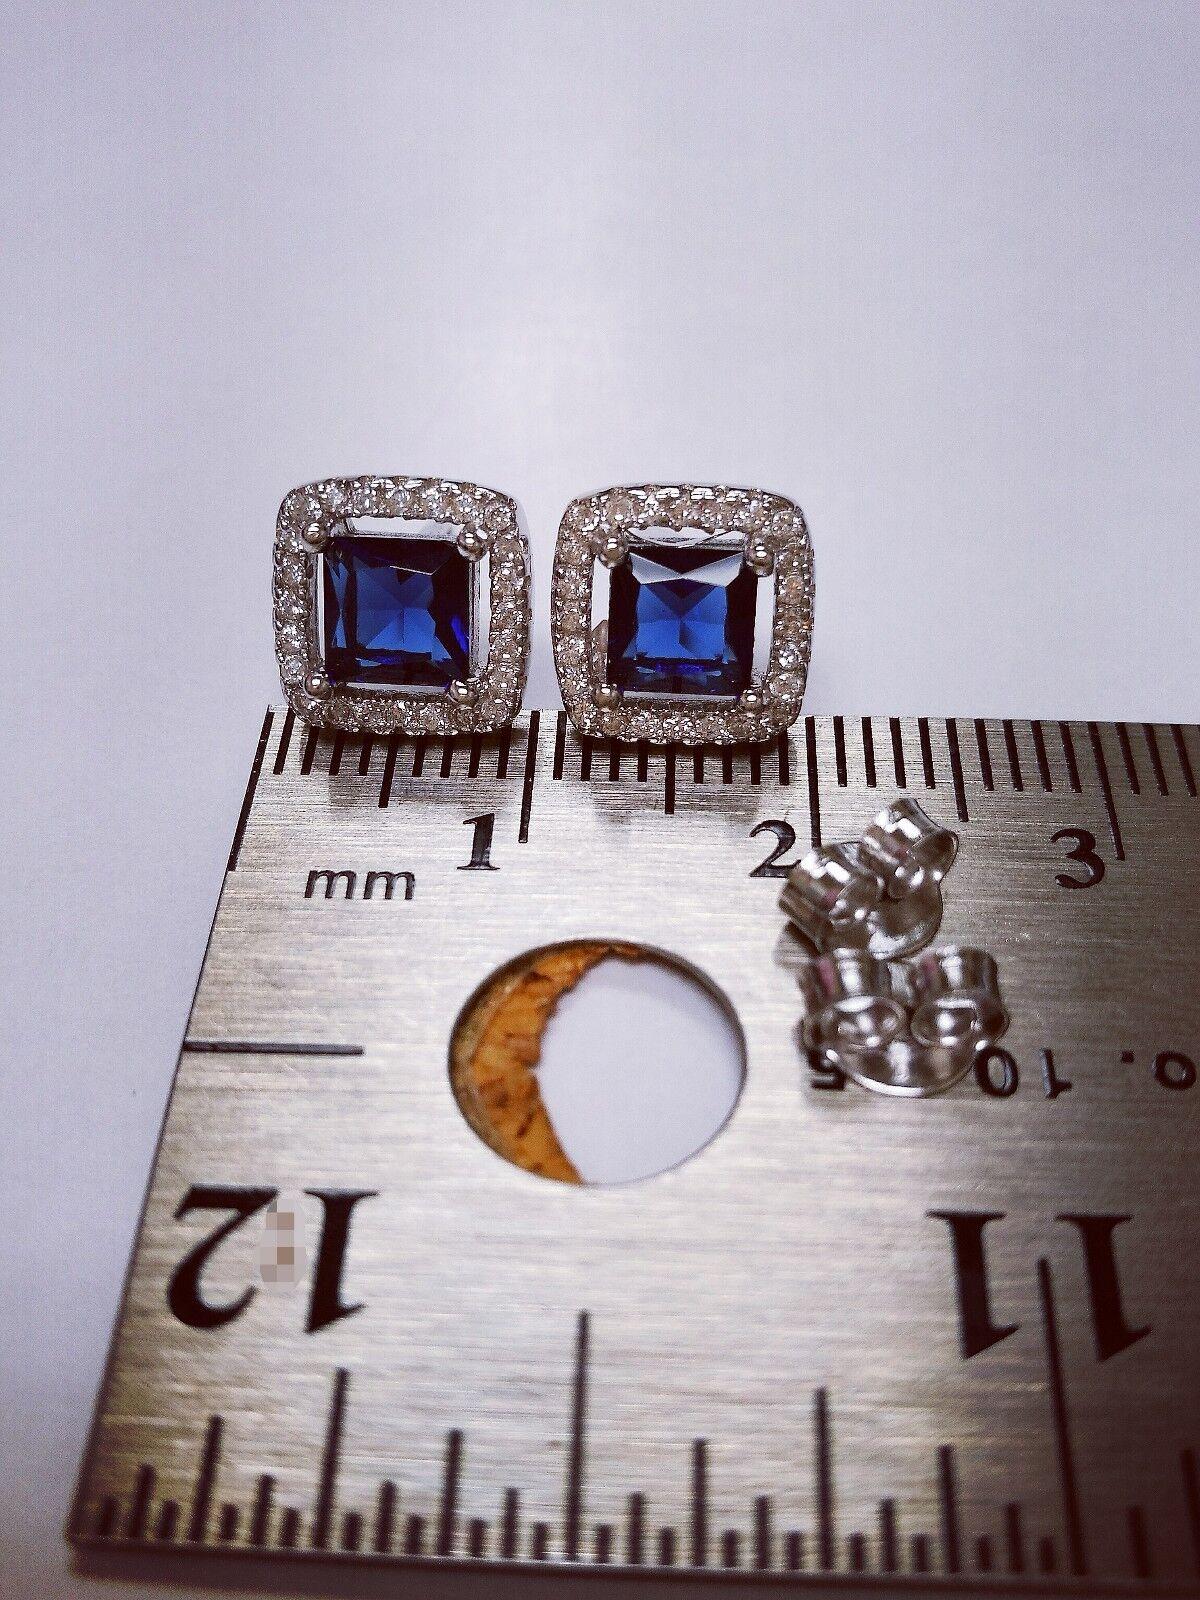 2 Ct Diamond Halo Stud Earrings with Blue Sapphire Women's Studs 14K White Gold 6